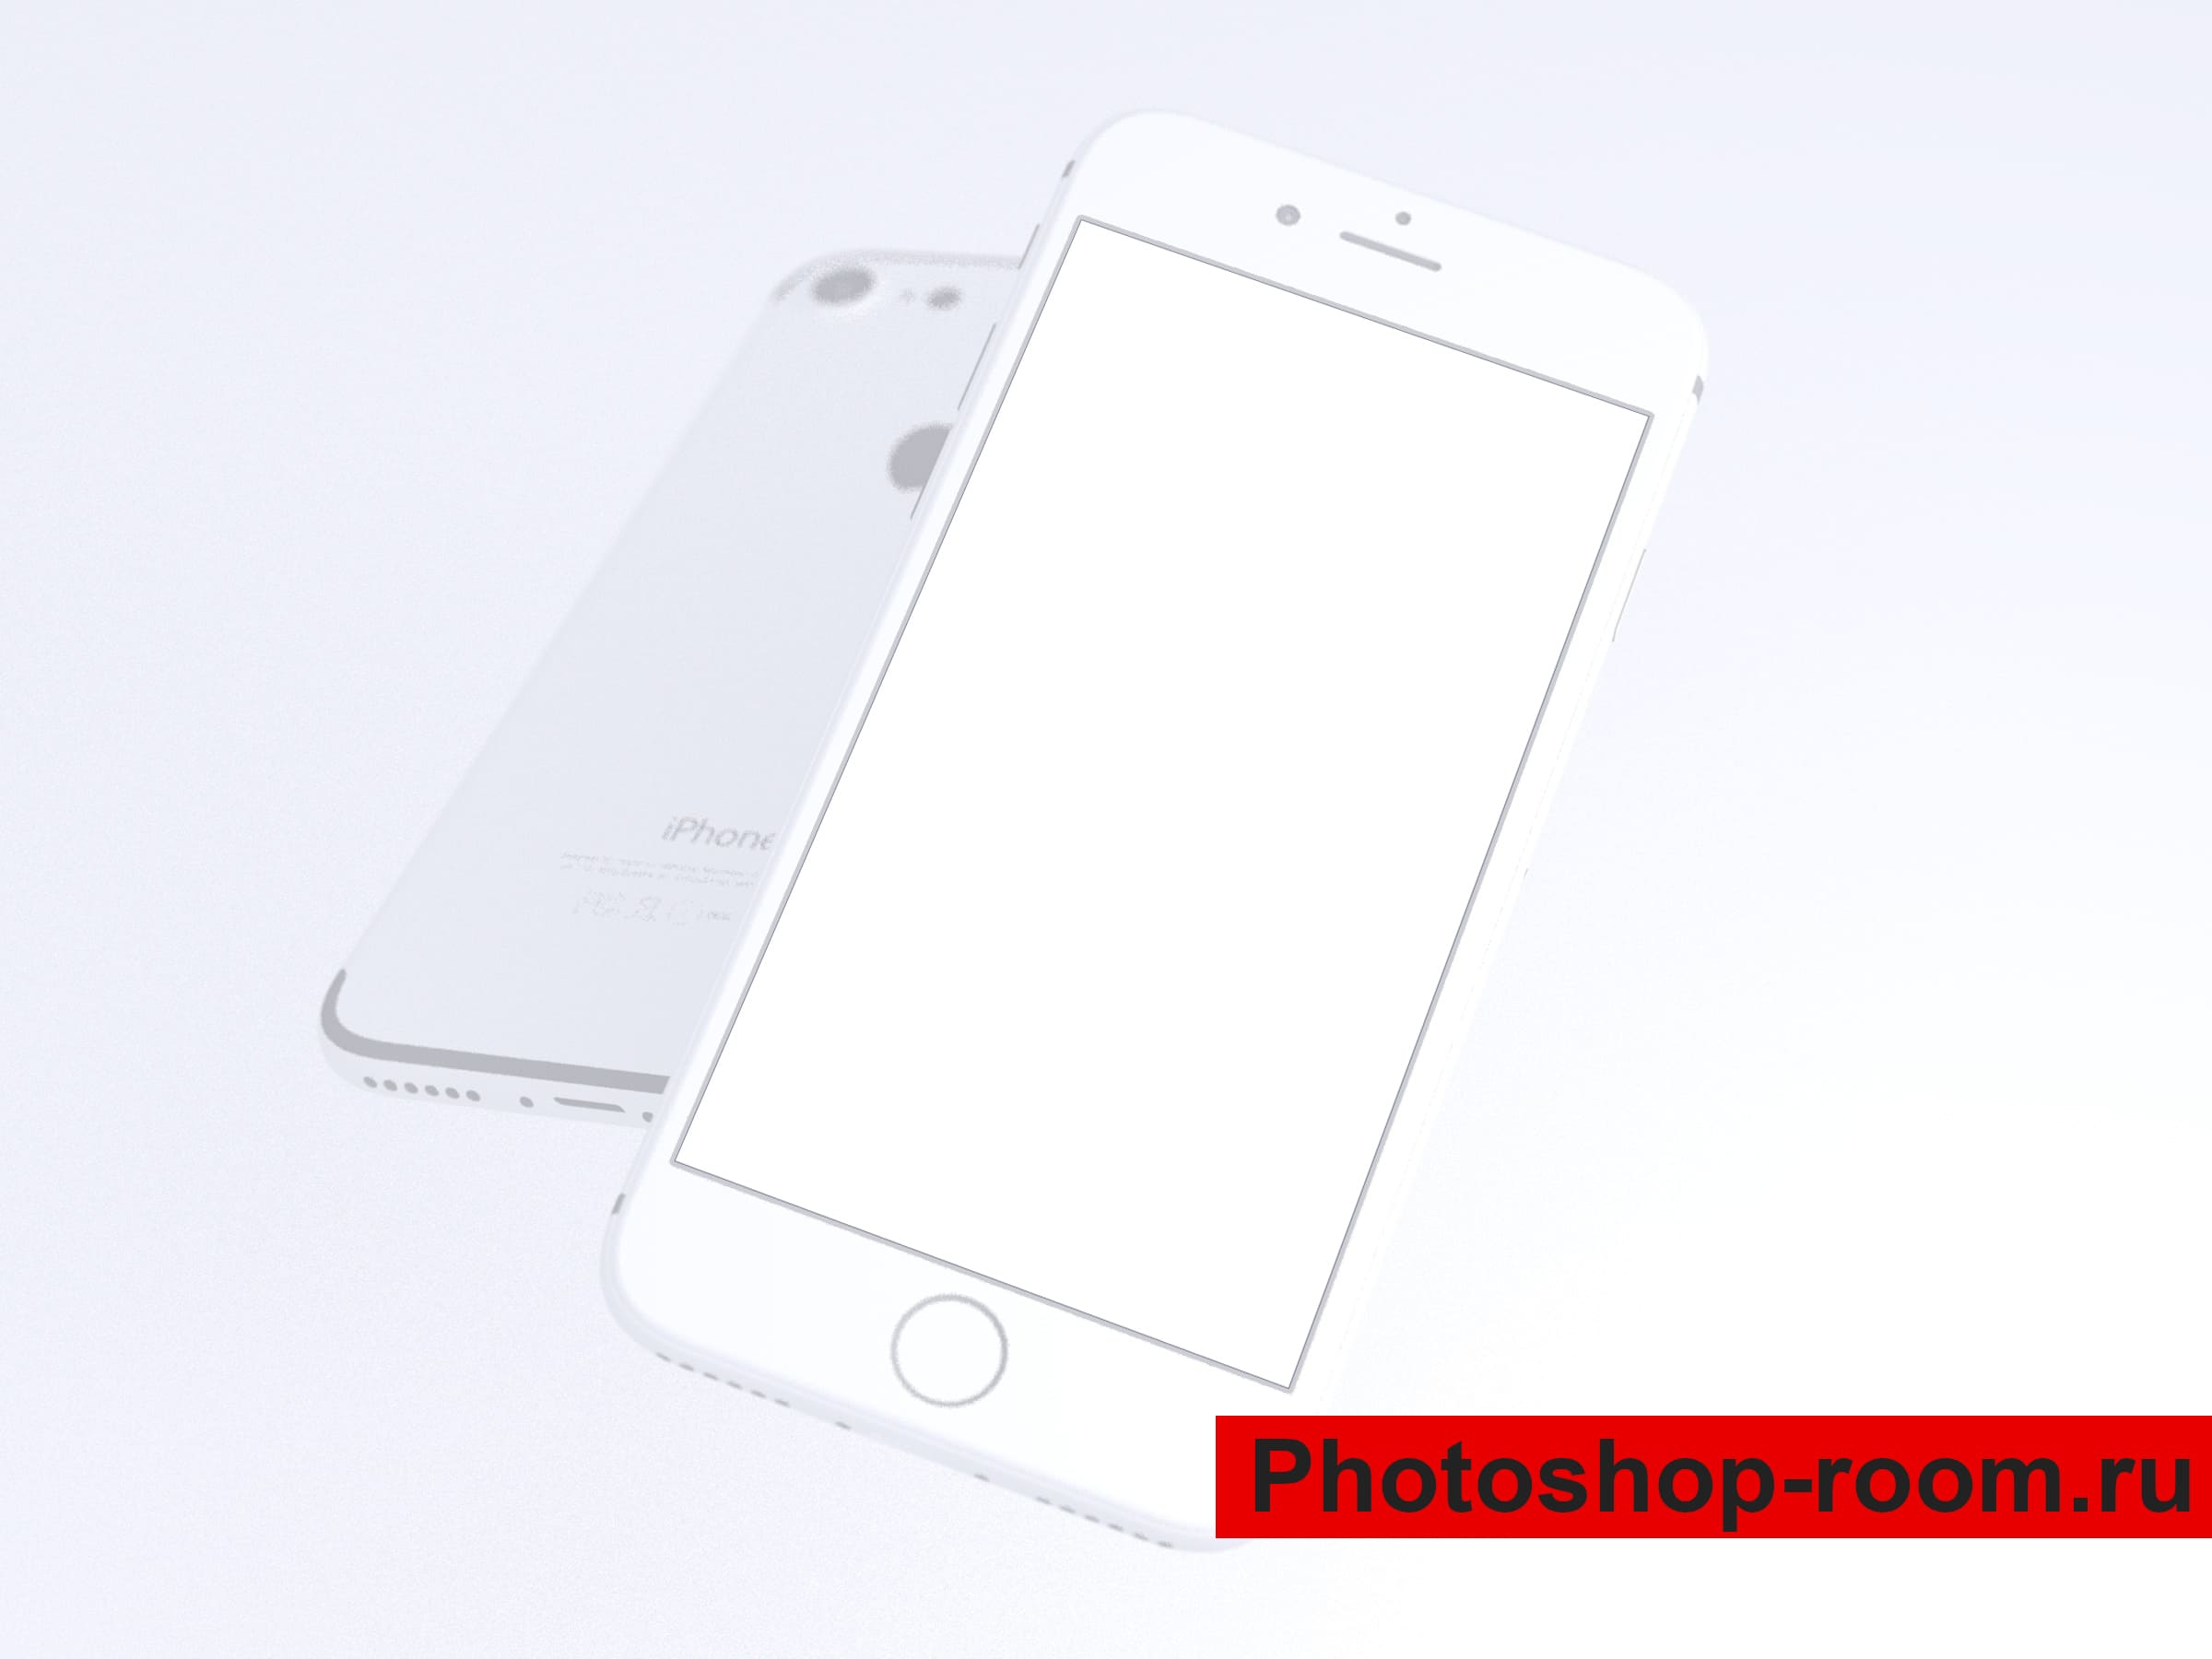 Mockup iphone 7